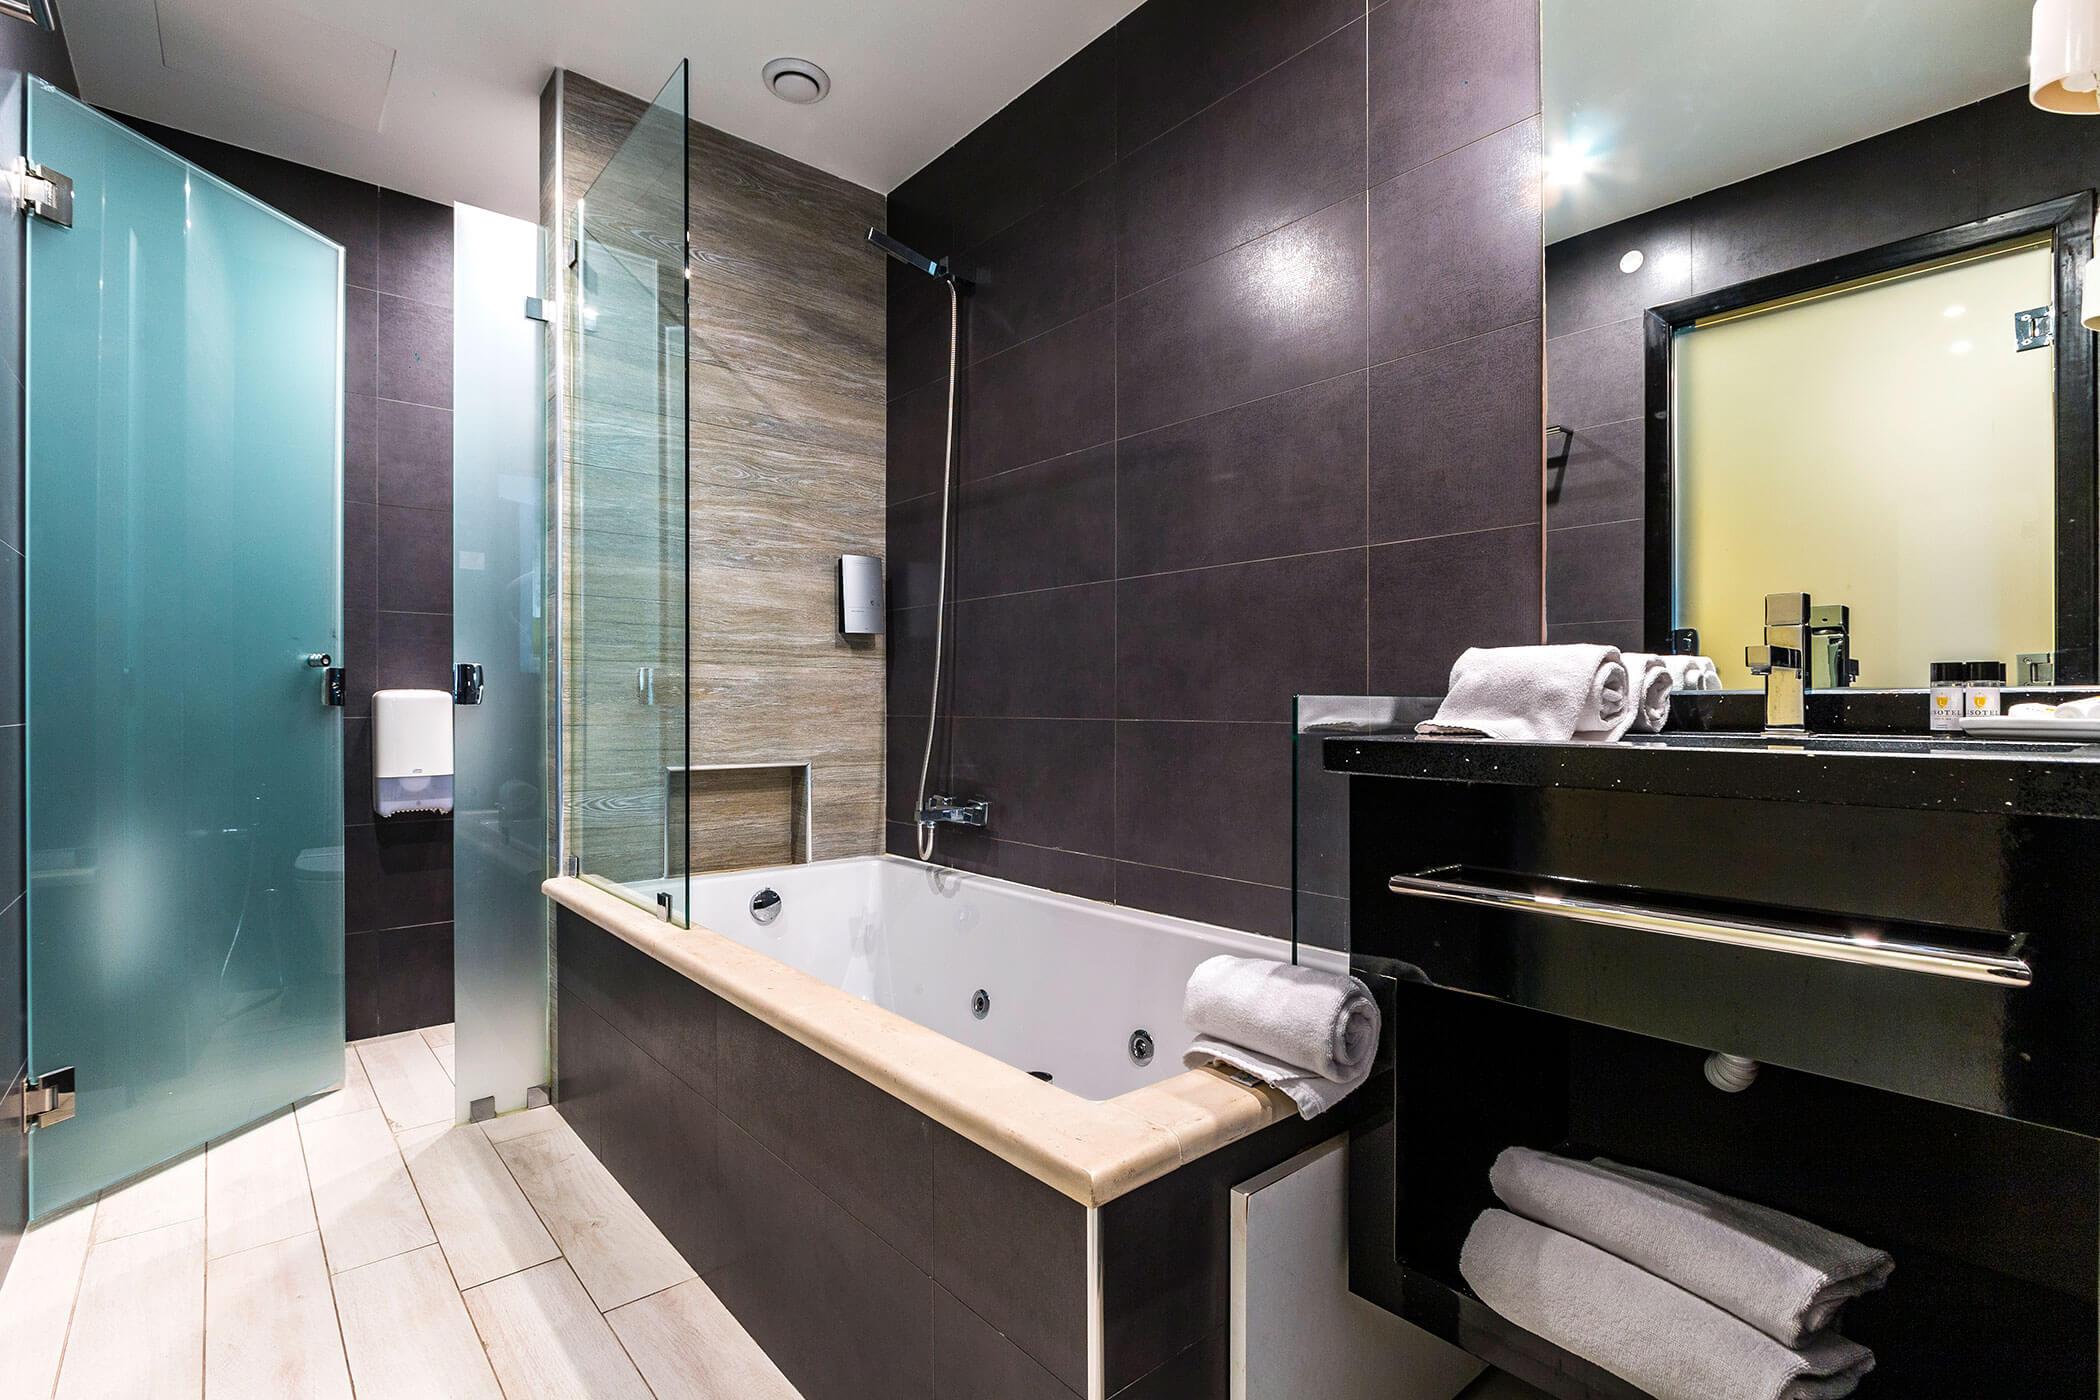 Suite Pinhal d'el Rei D. Dinis - Lisotel Hotel e Spa, Leiria